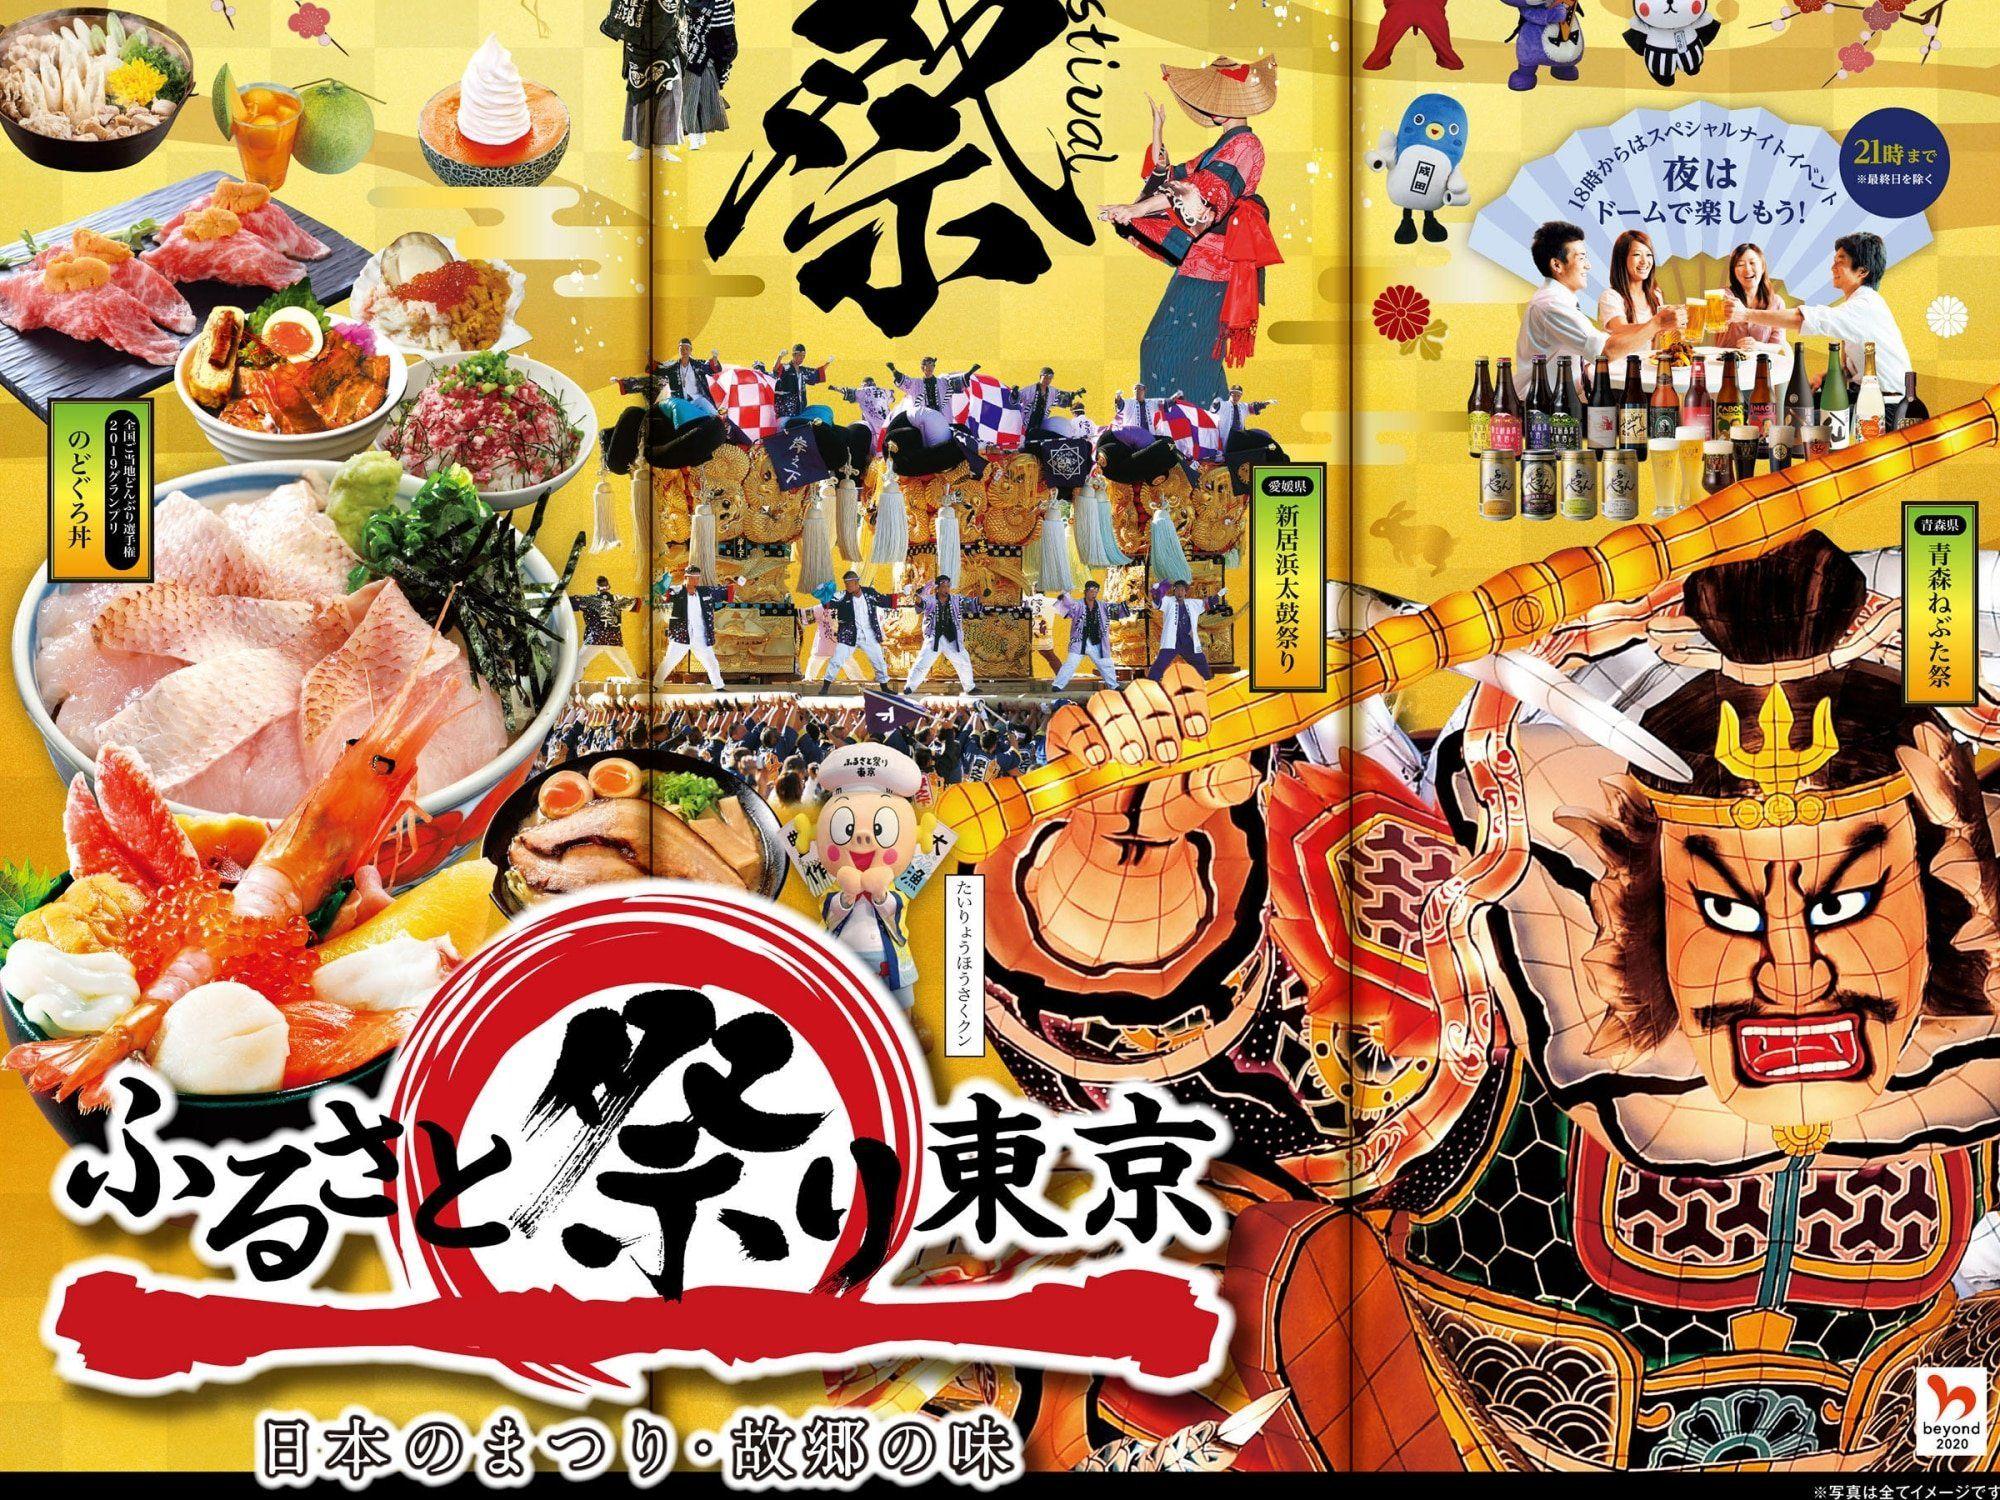 Furusato Matsuri Tokyo 2020 Regional Food And Festivals At Tokyo Dome Matcha Japan Travel Web Magazine Furusato Mats In 2020 Matcha Japan Japan Travel Tokyo Dome